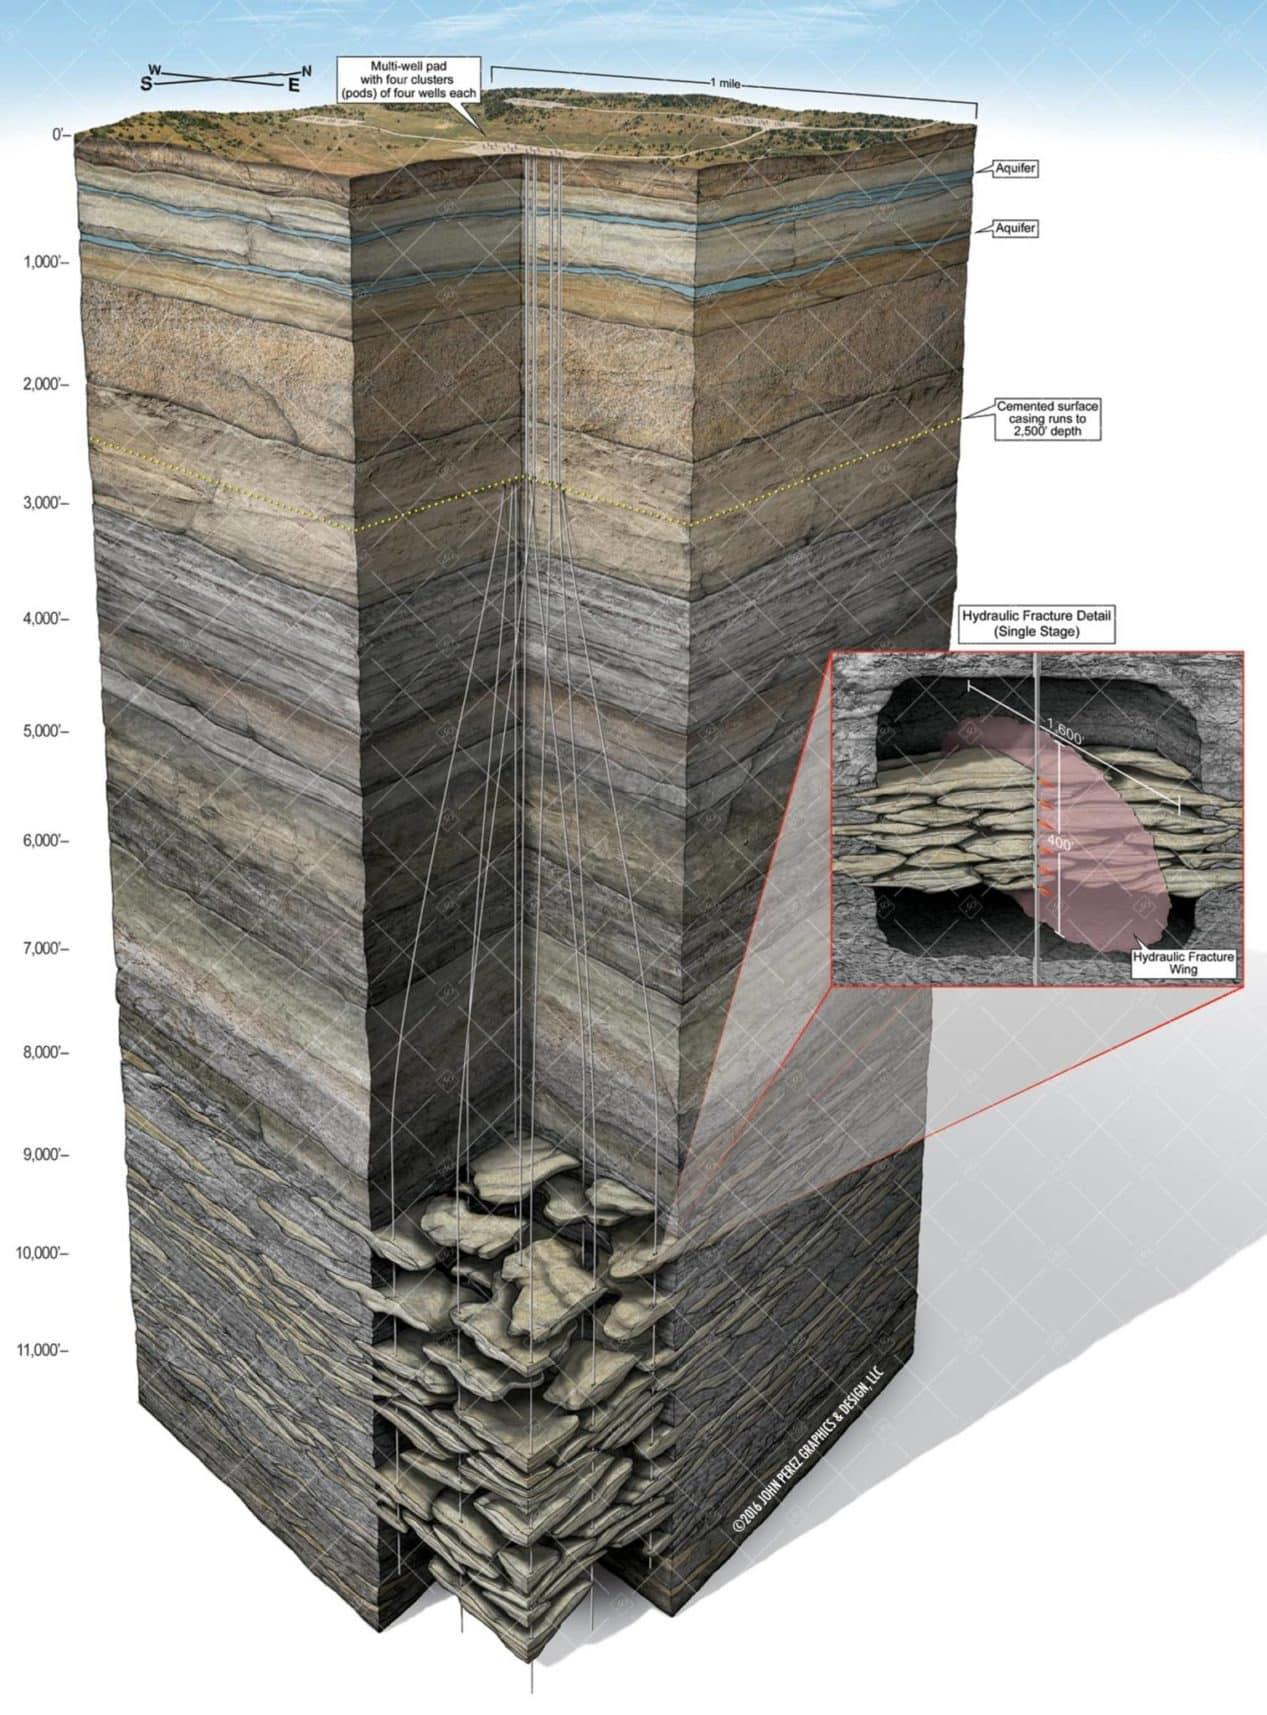 Multi Vertical Drilling Schematic Fluvial Sands, oil and gas graphics, oil and gas schematics, drilling geology, john perez graphics, geology illustration